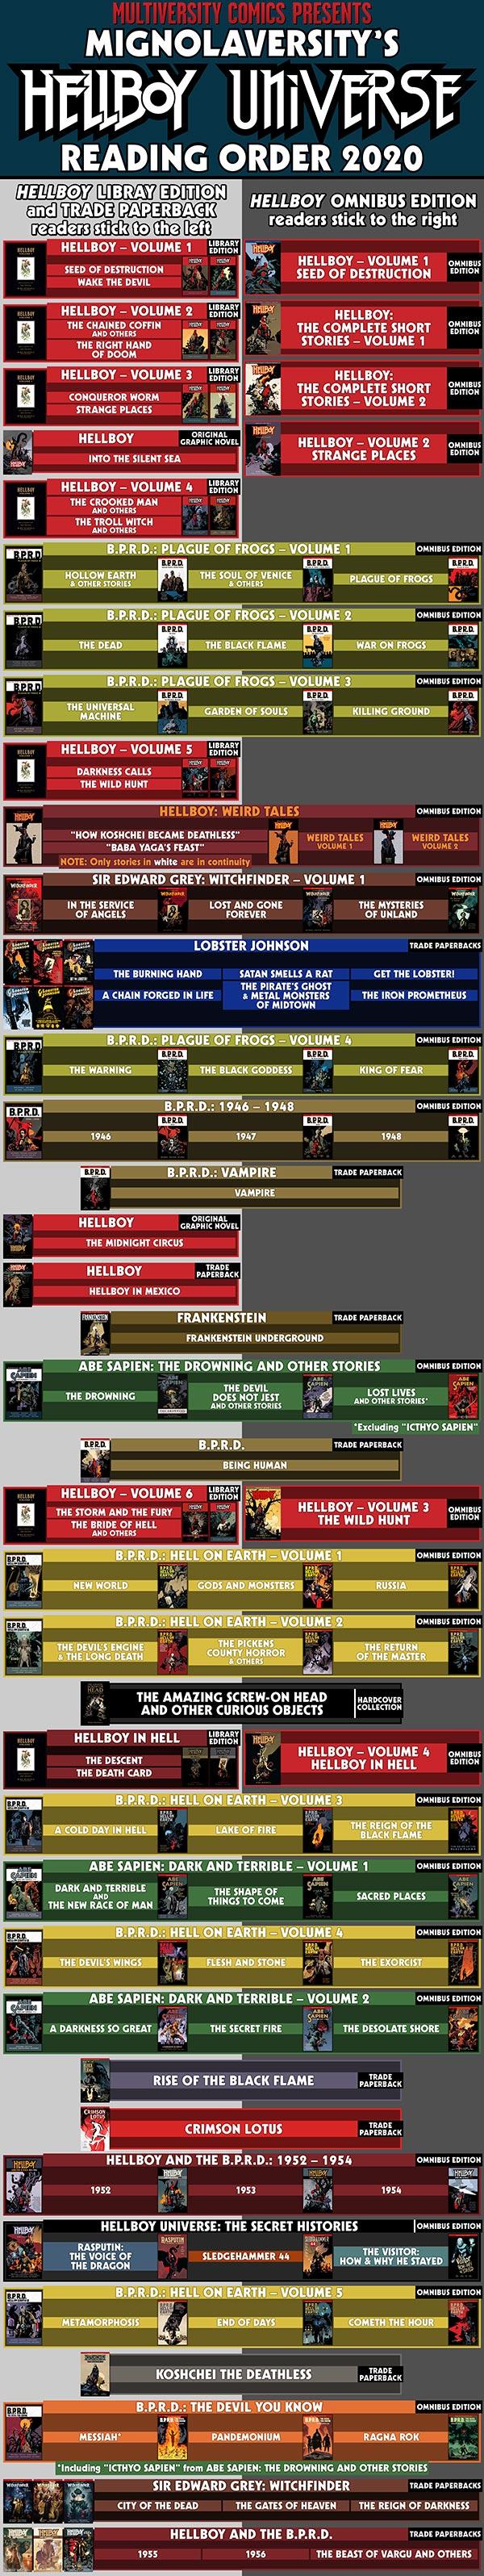 Hellboy Universe Reading Order 2020